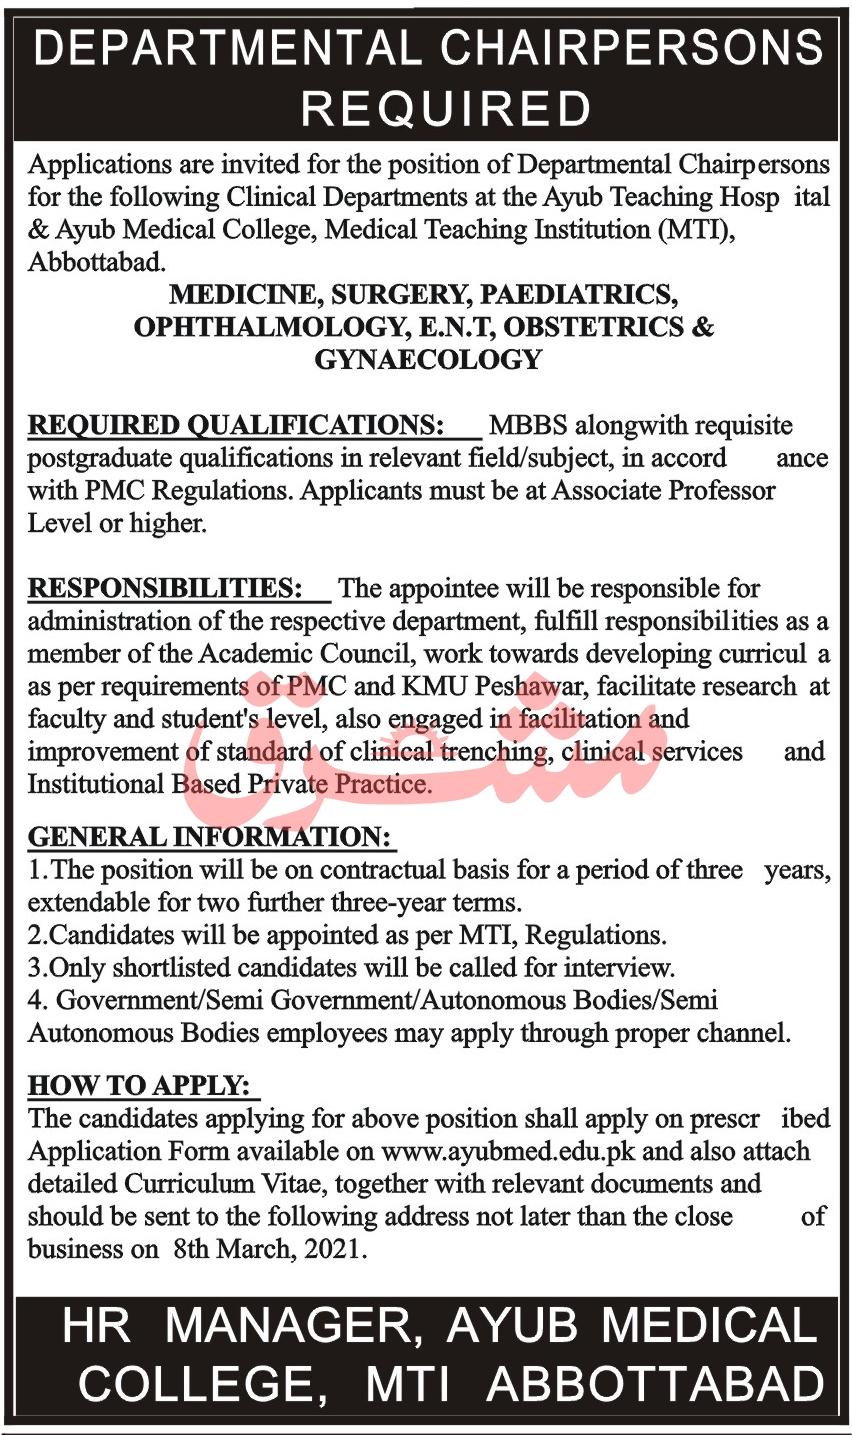 Ayub Medical College MTI Abbottabad Jobs 2021